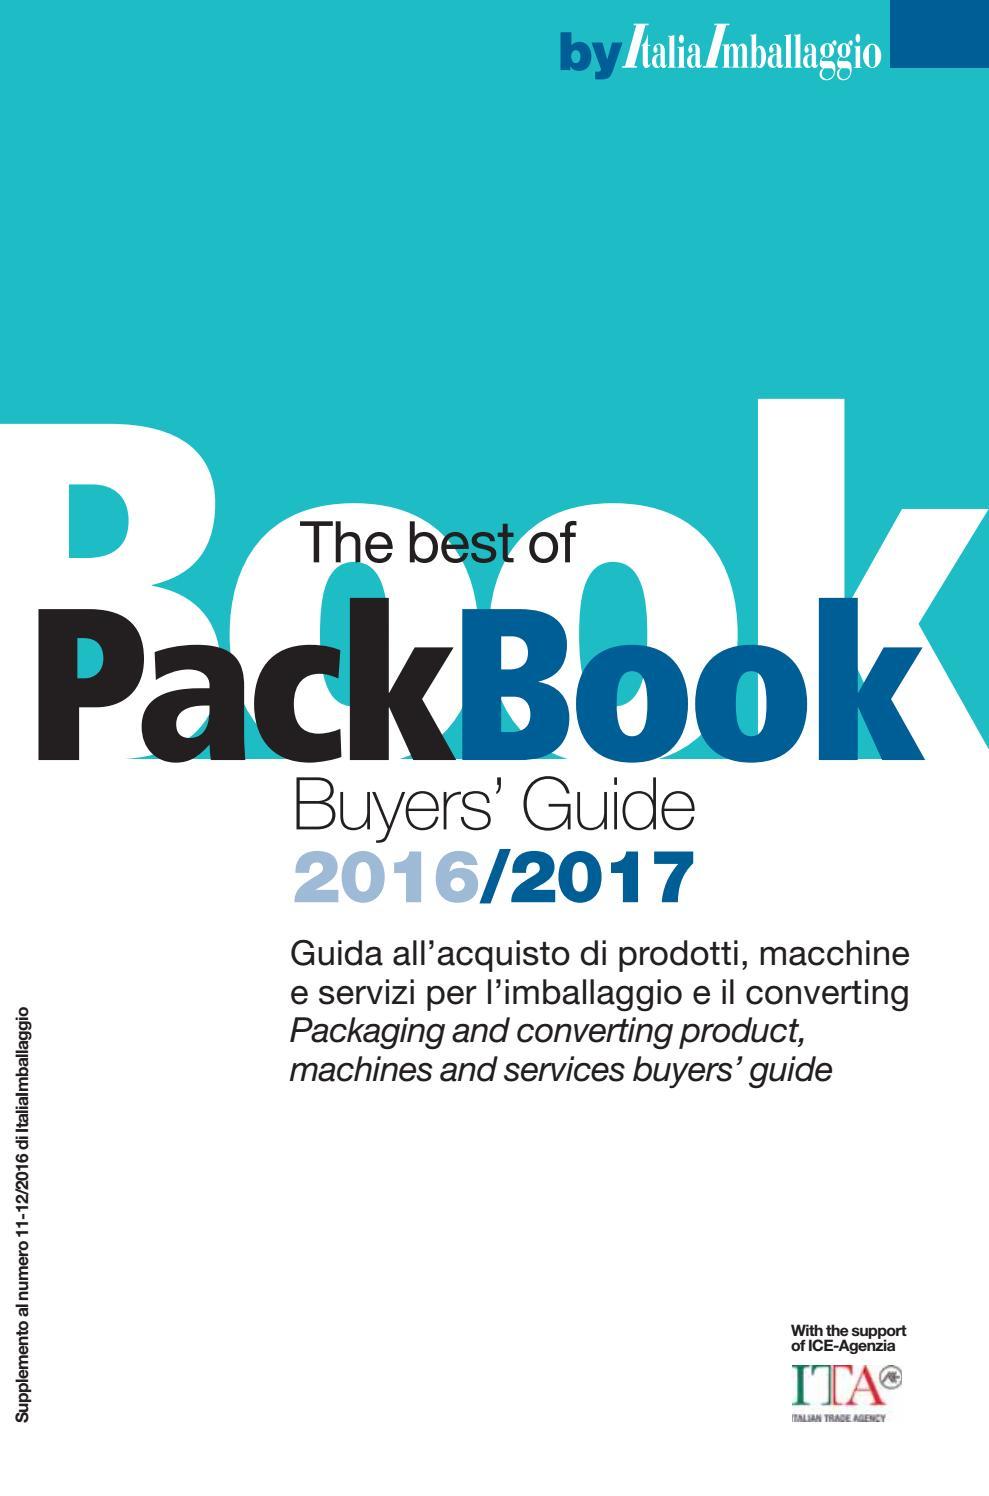 Packbook 2016 2017 by Edizioni Dativo - issuu 41d4eacbd61